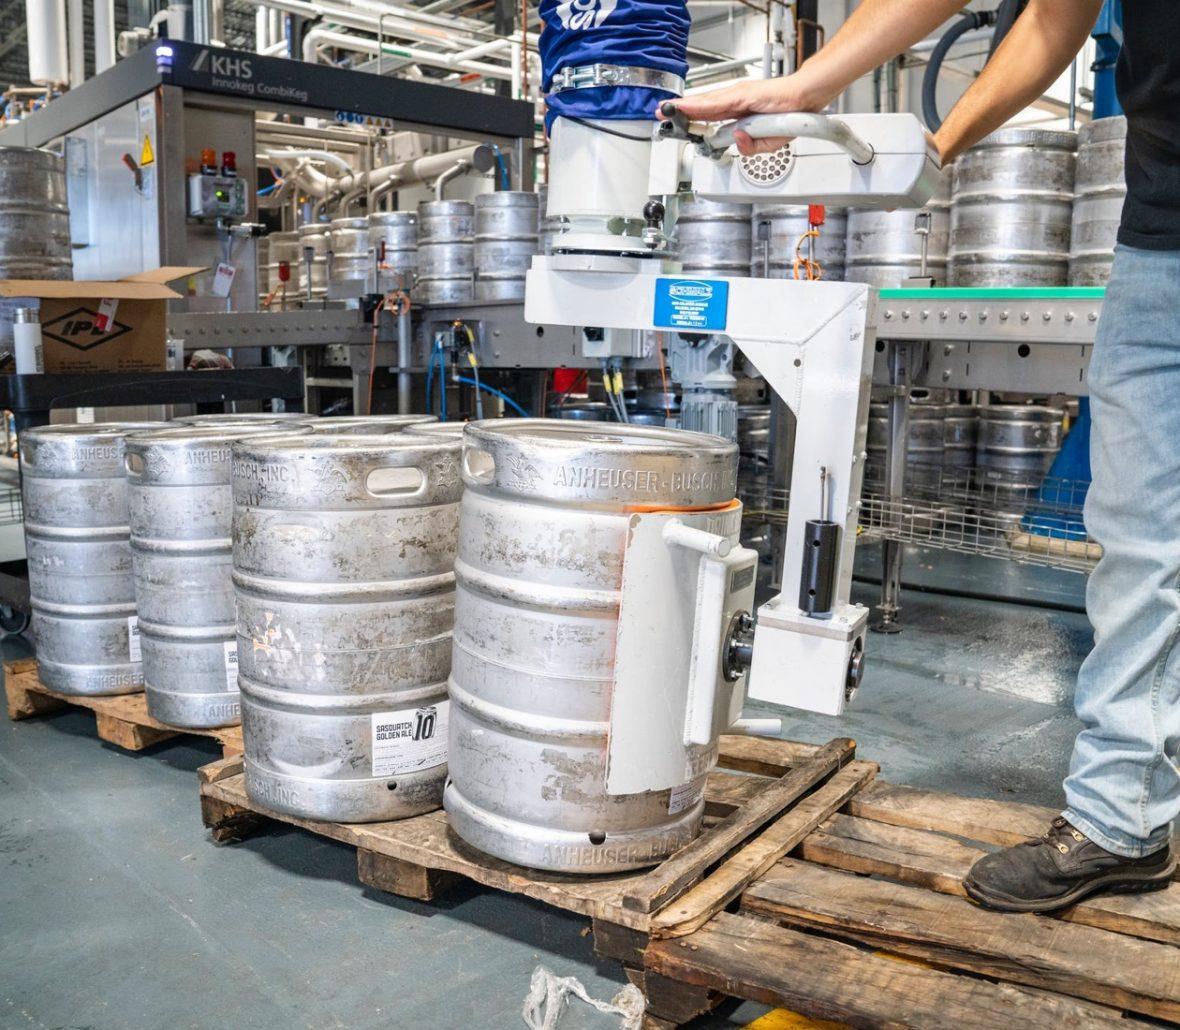 Brewer on forklift moving kegs